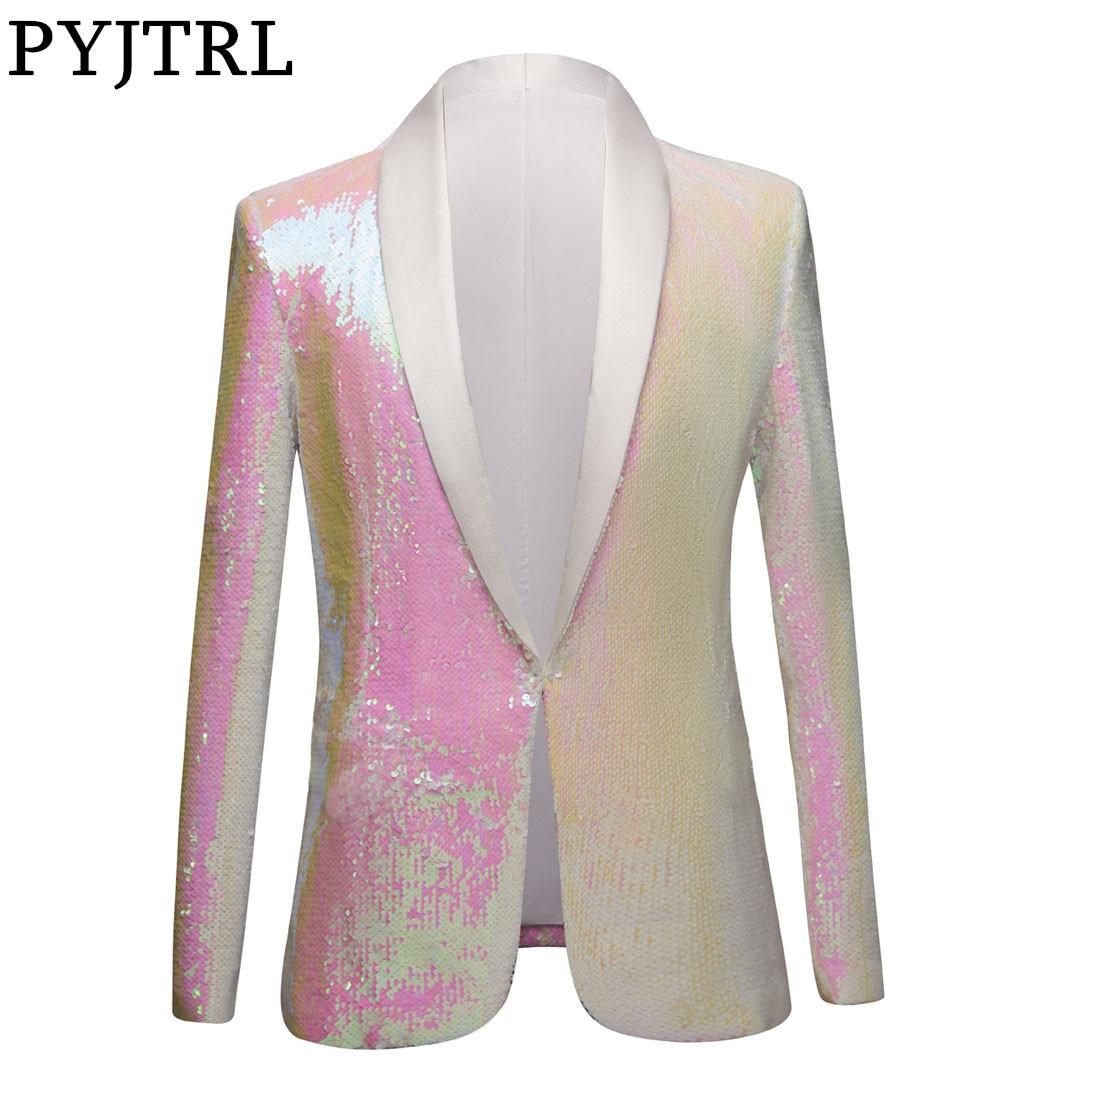 PYJTRL Full Sequins Series Men White Pink Sequins Blazers Gentleman Prom Dress Suit Jacket Night Club Singers Slim Fit Costume